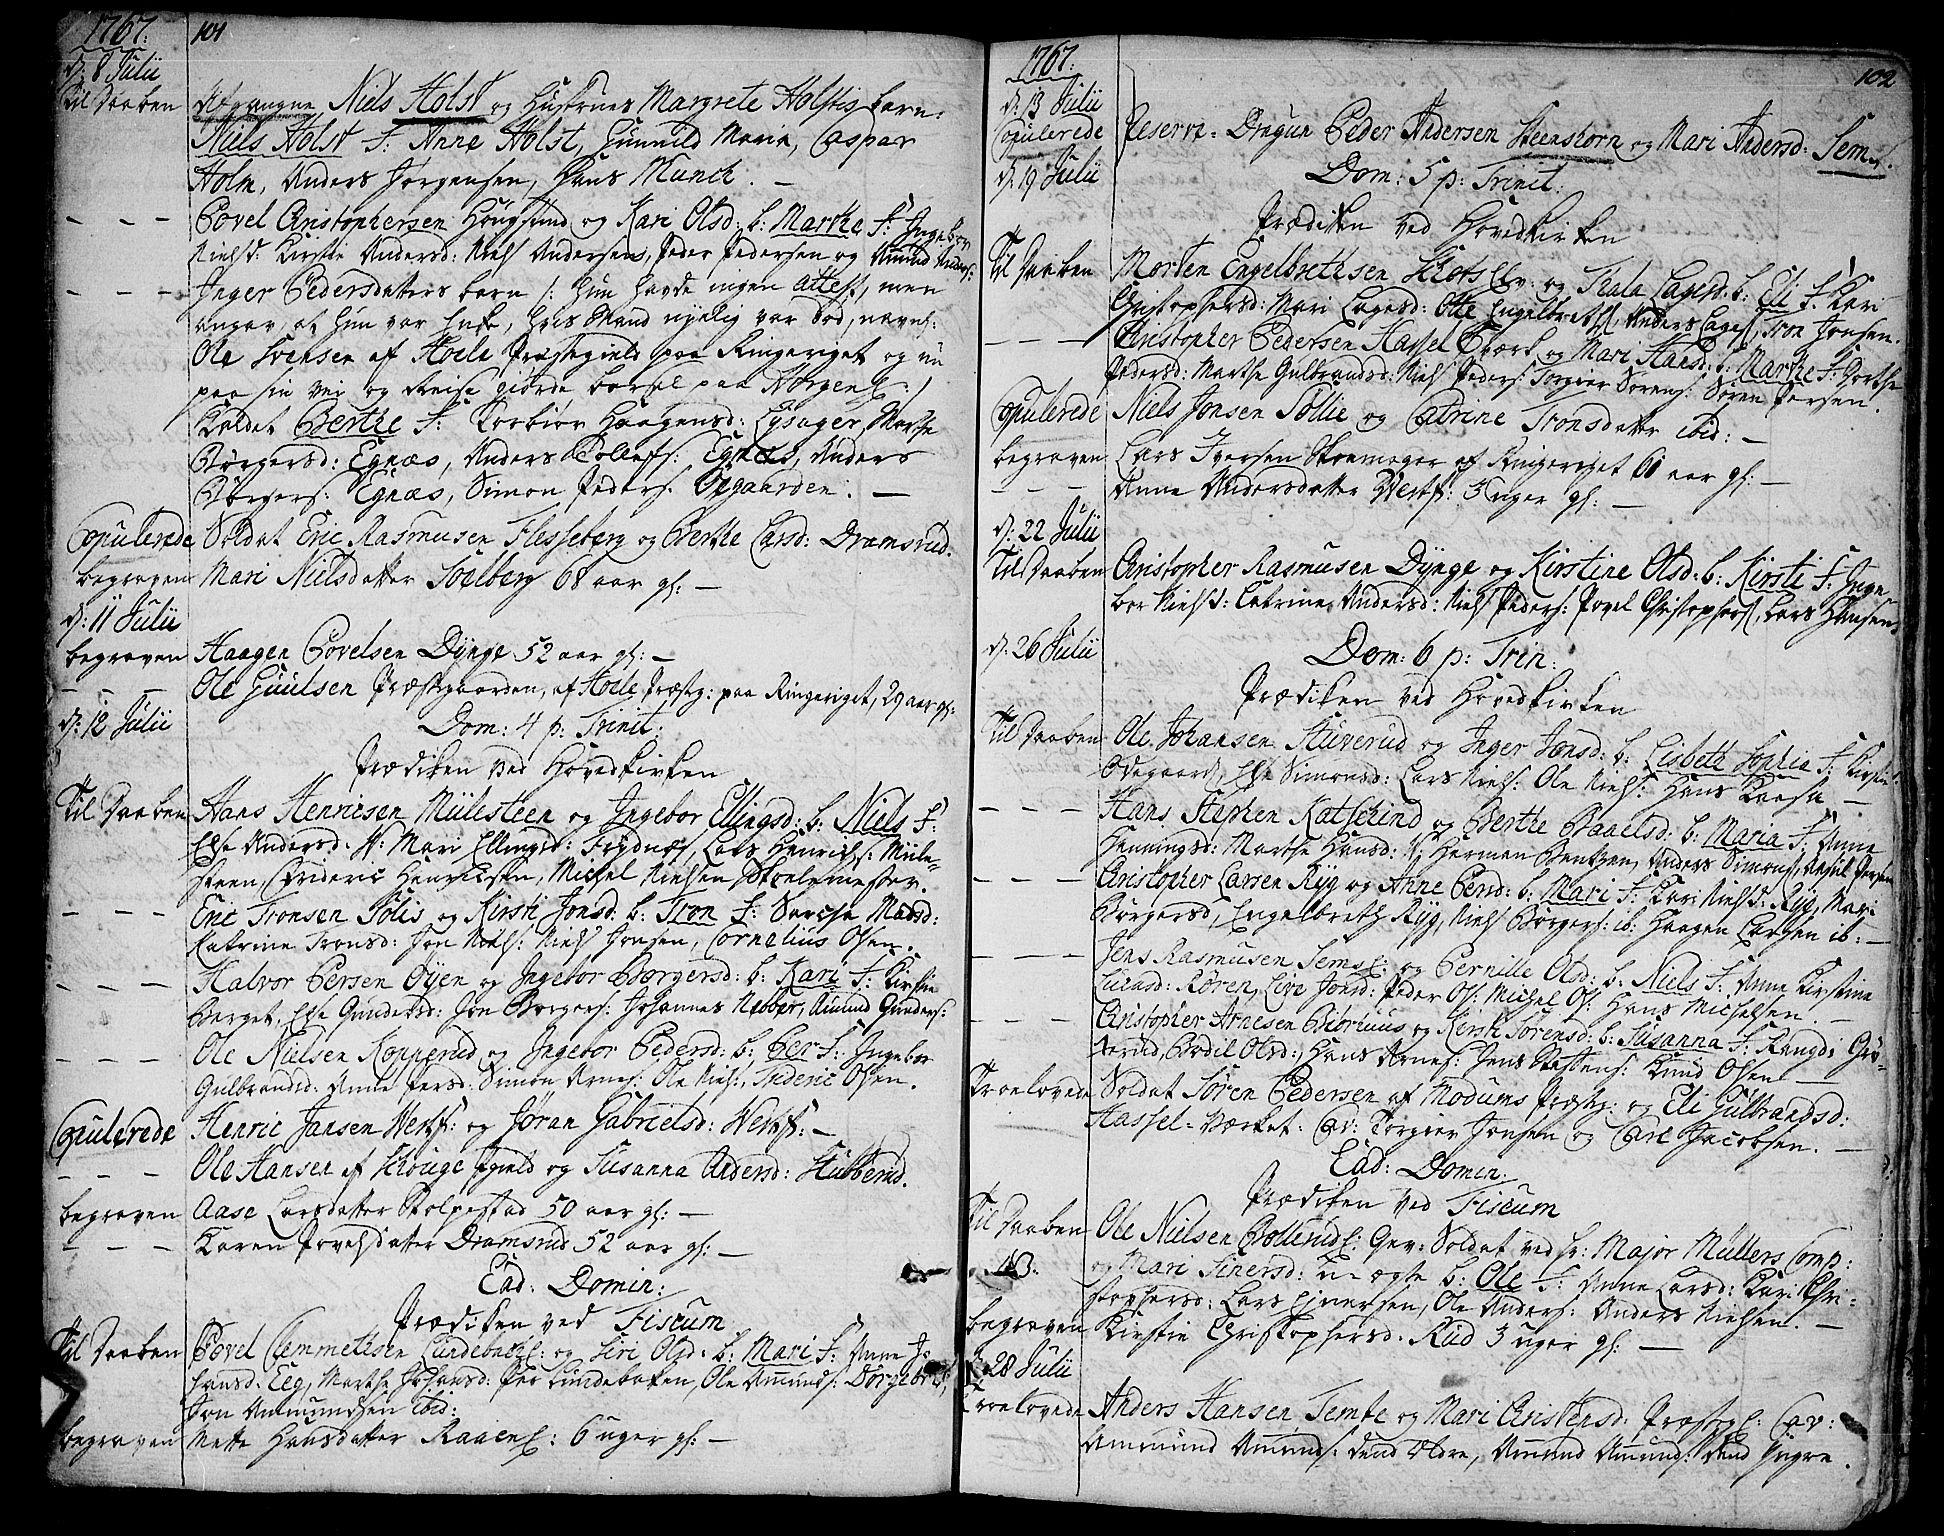 SAKO, Eiker kirkebøker, F/Fa/L0008: Ministerialbok nr. I 8, 1764-1788, s. 101-102